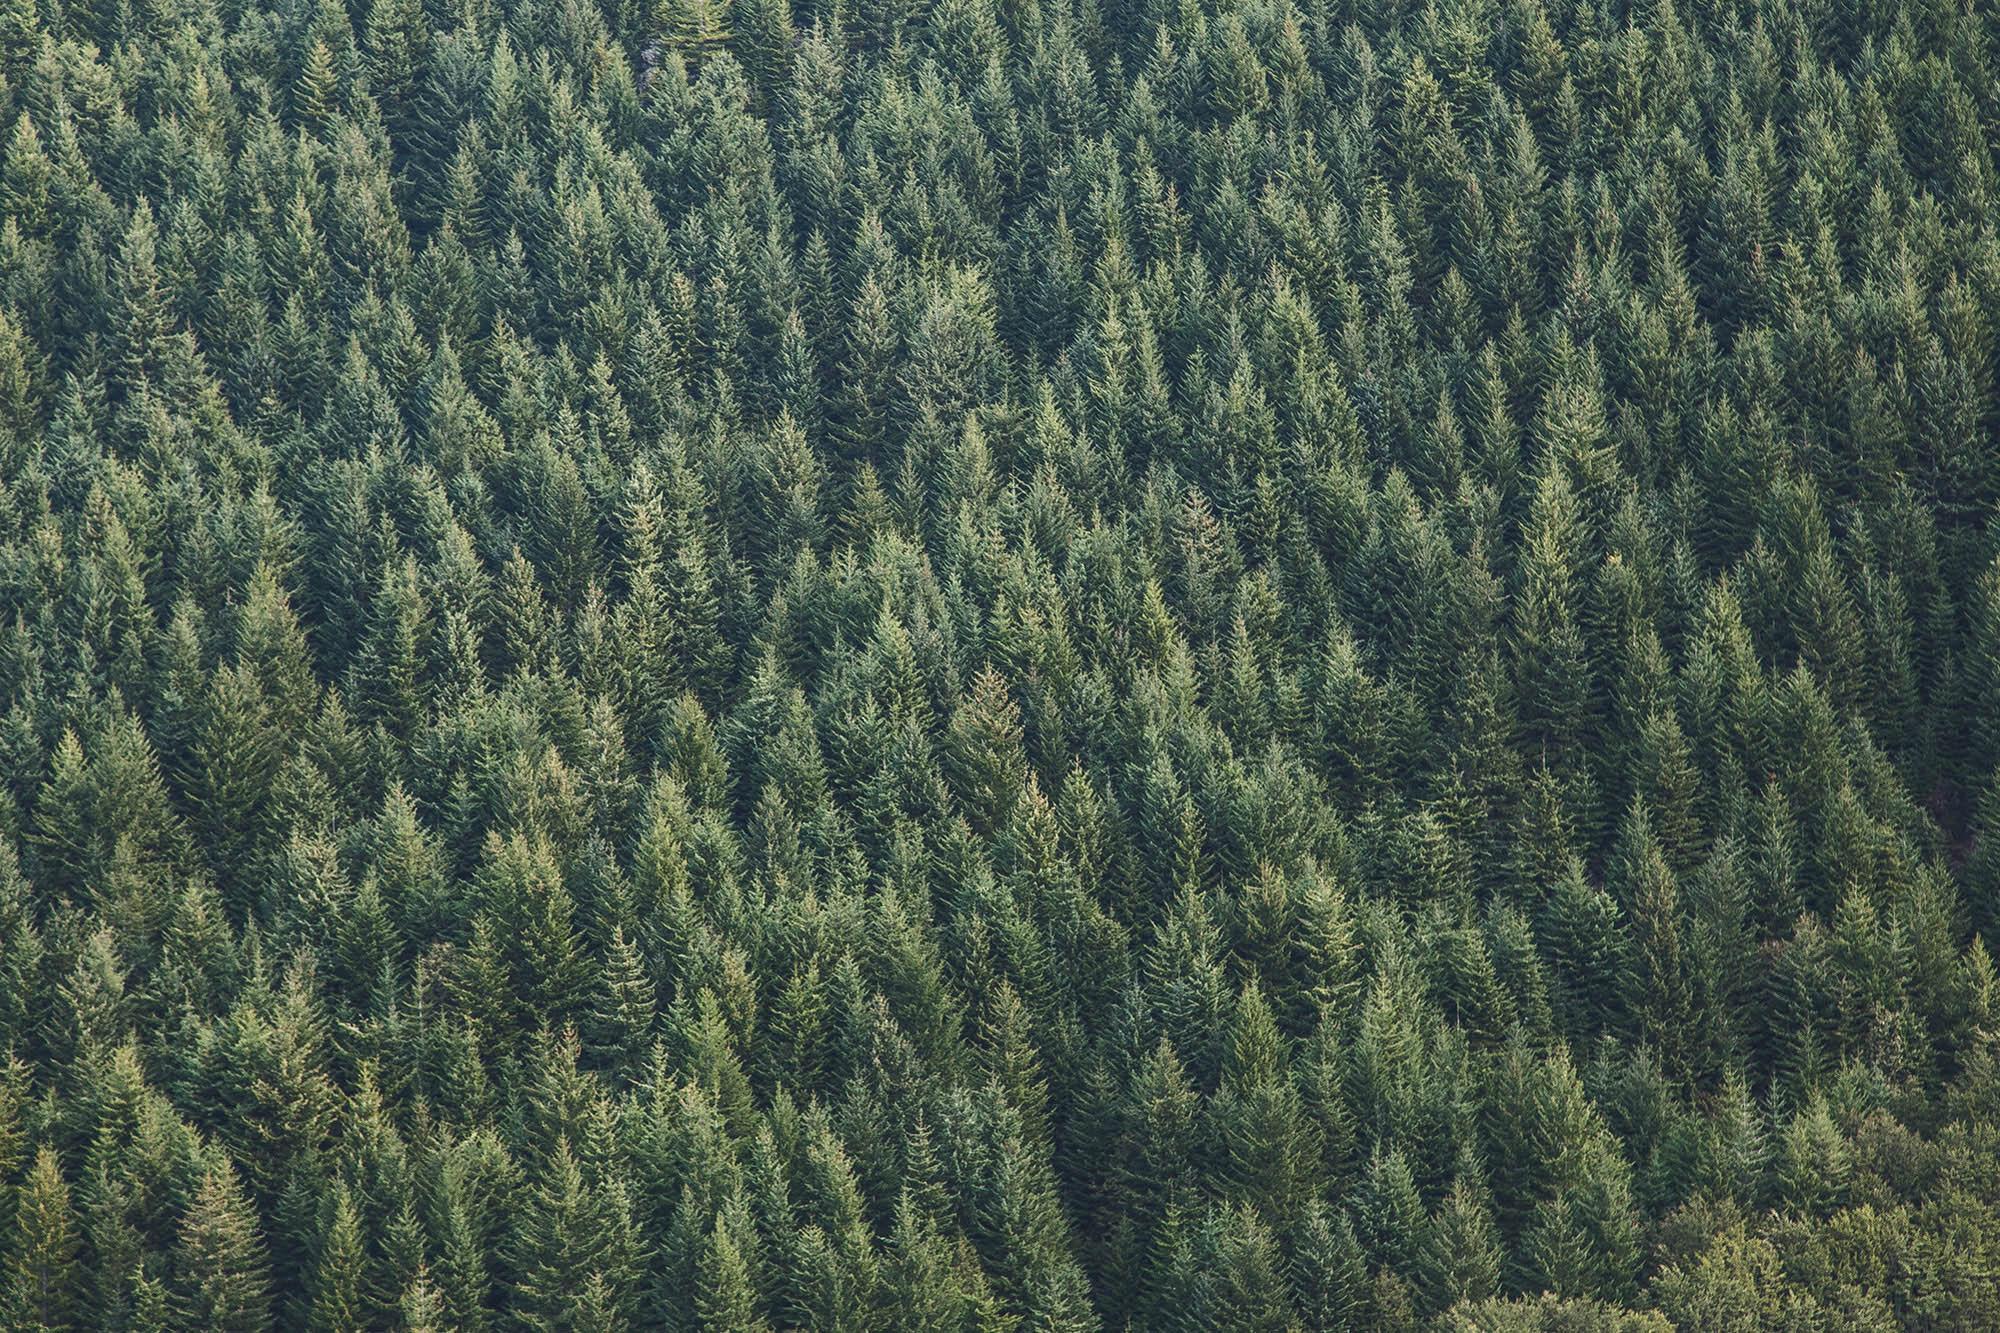 Holz ist Natur.